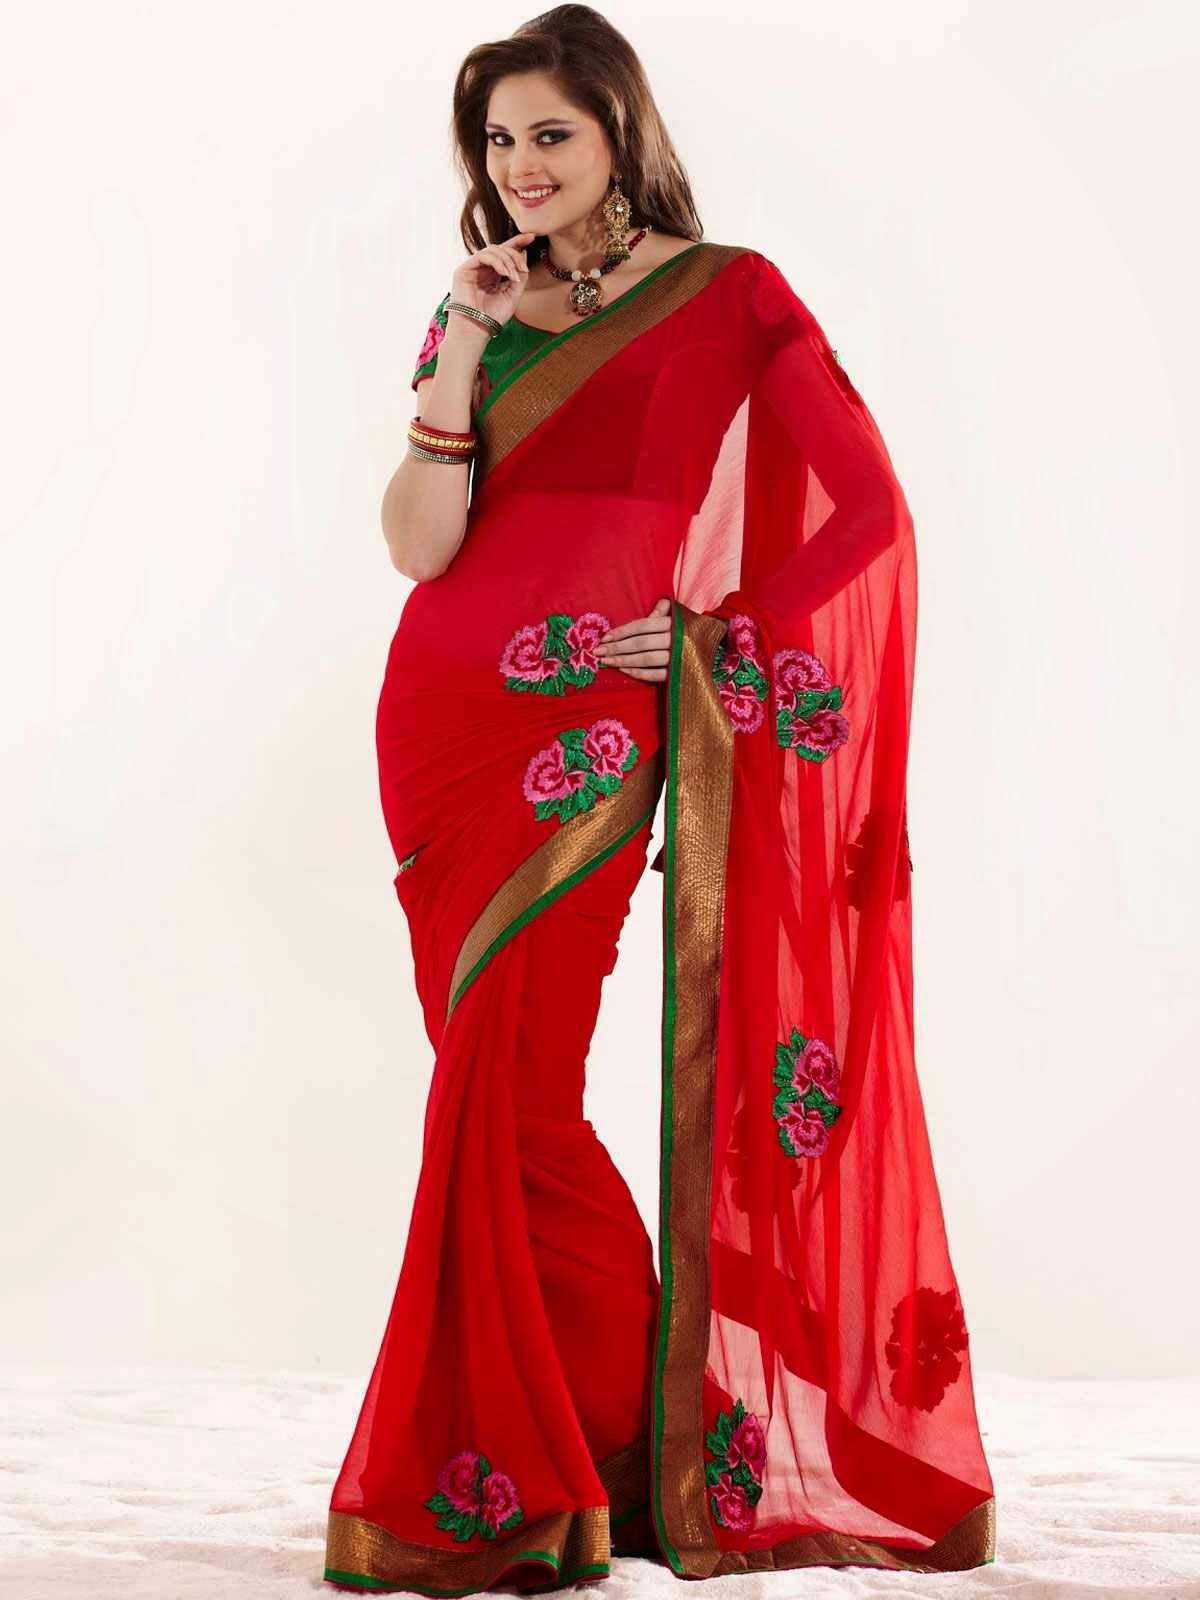 Indian Desi Females In Saree Full Hd  Photo Chocolate-4610